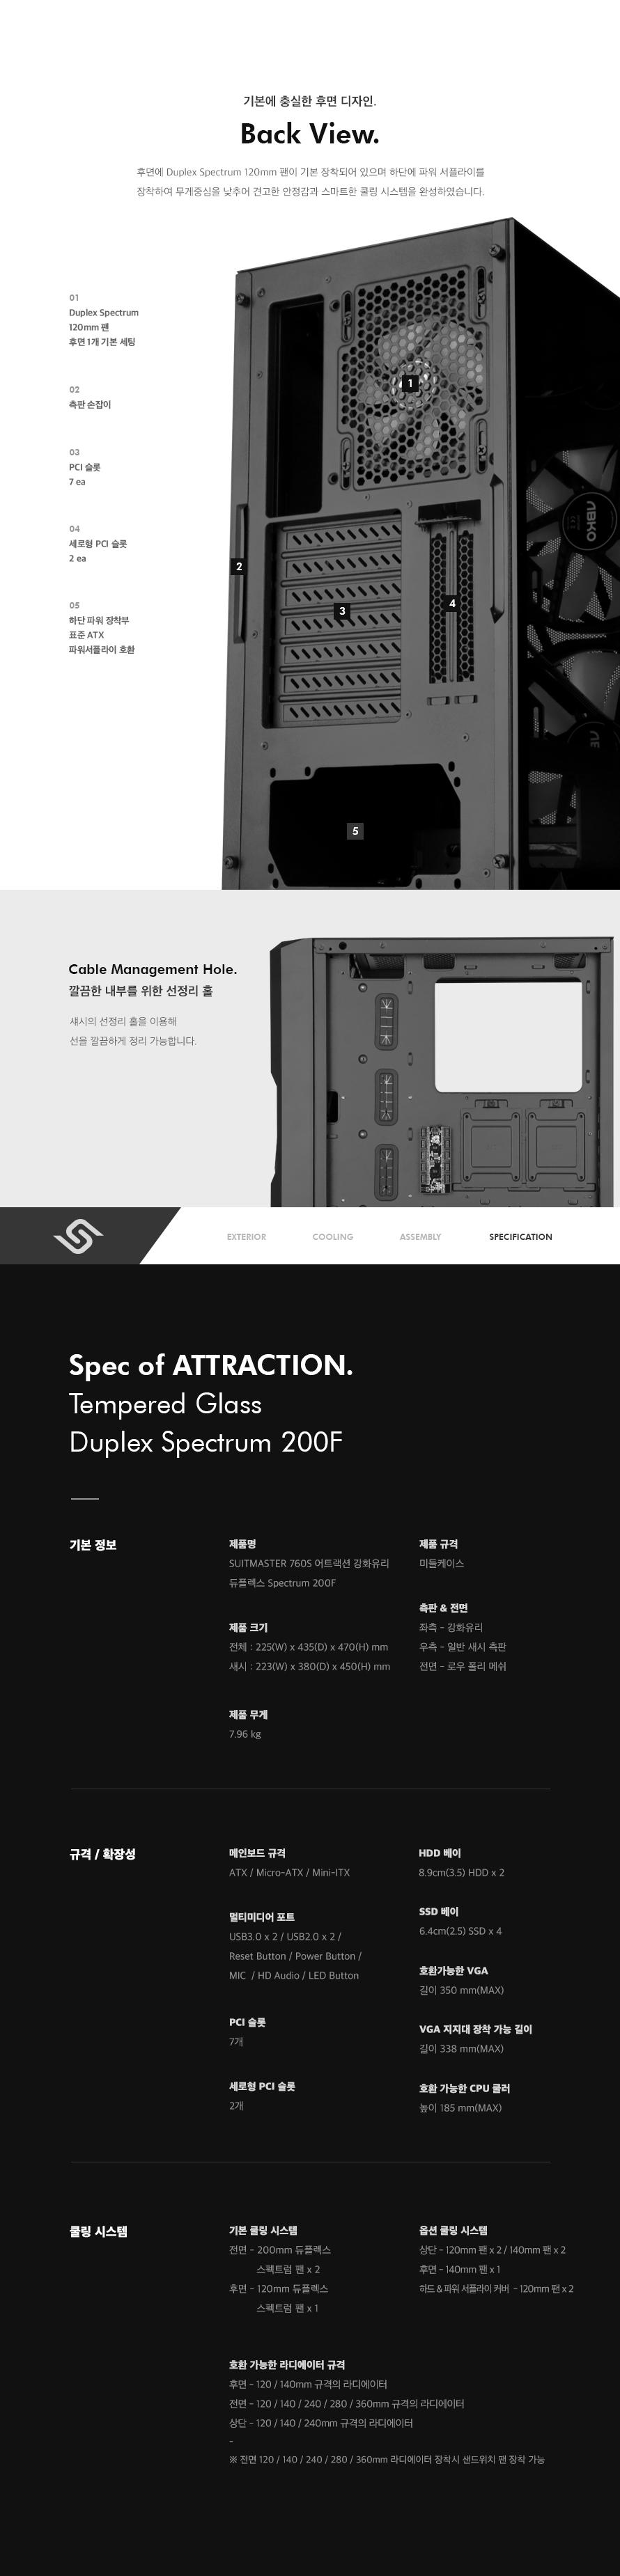 ABKO SUITMASTER 760S 어트랙션 강화유리 스펙트럼 Duplex(블랙)